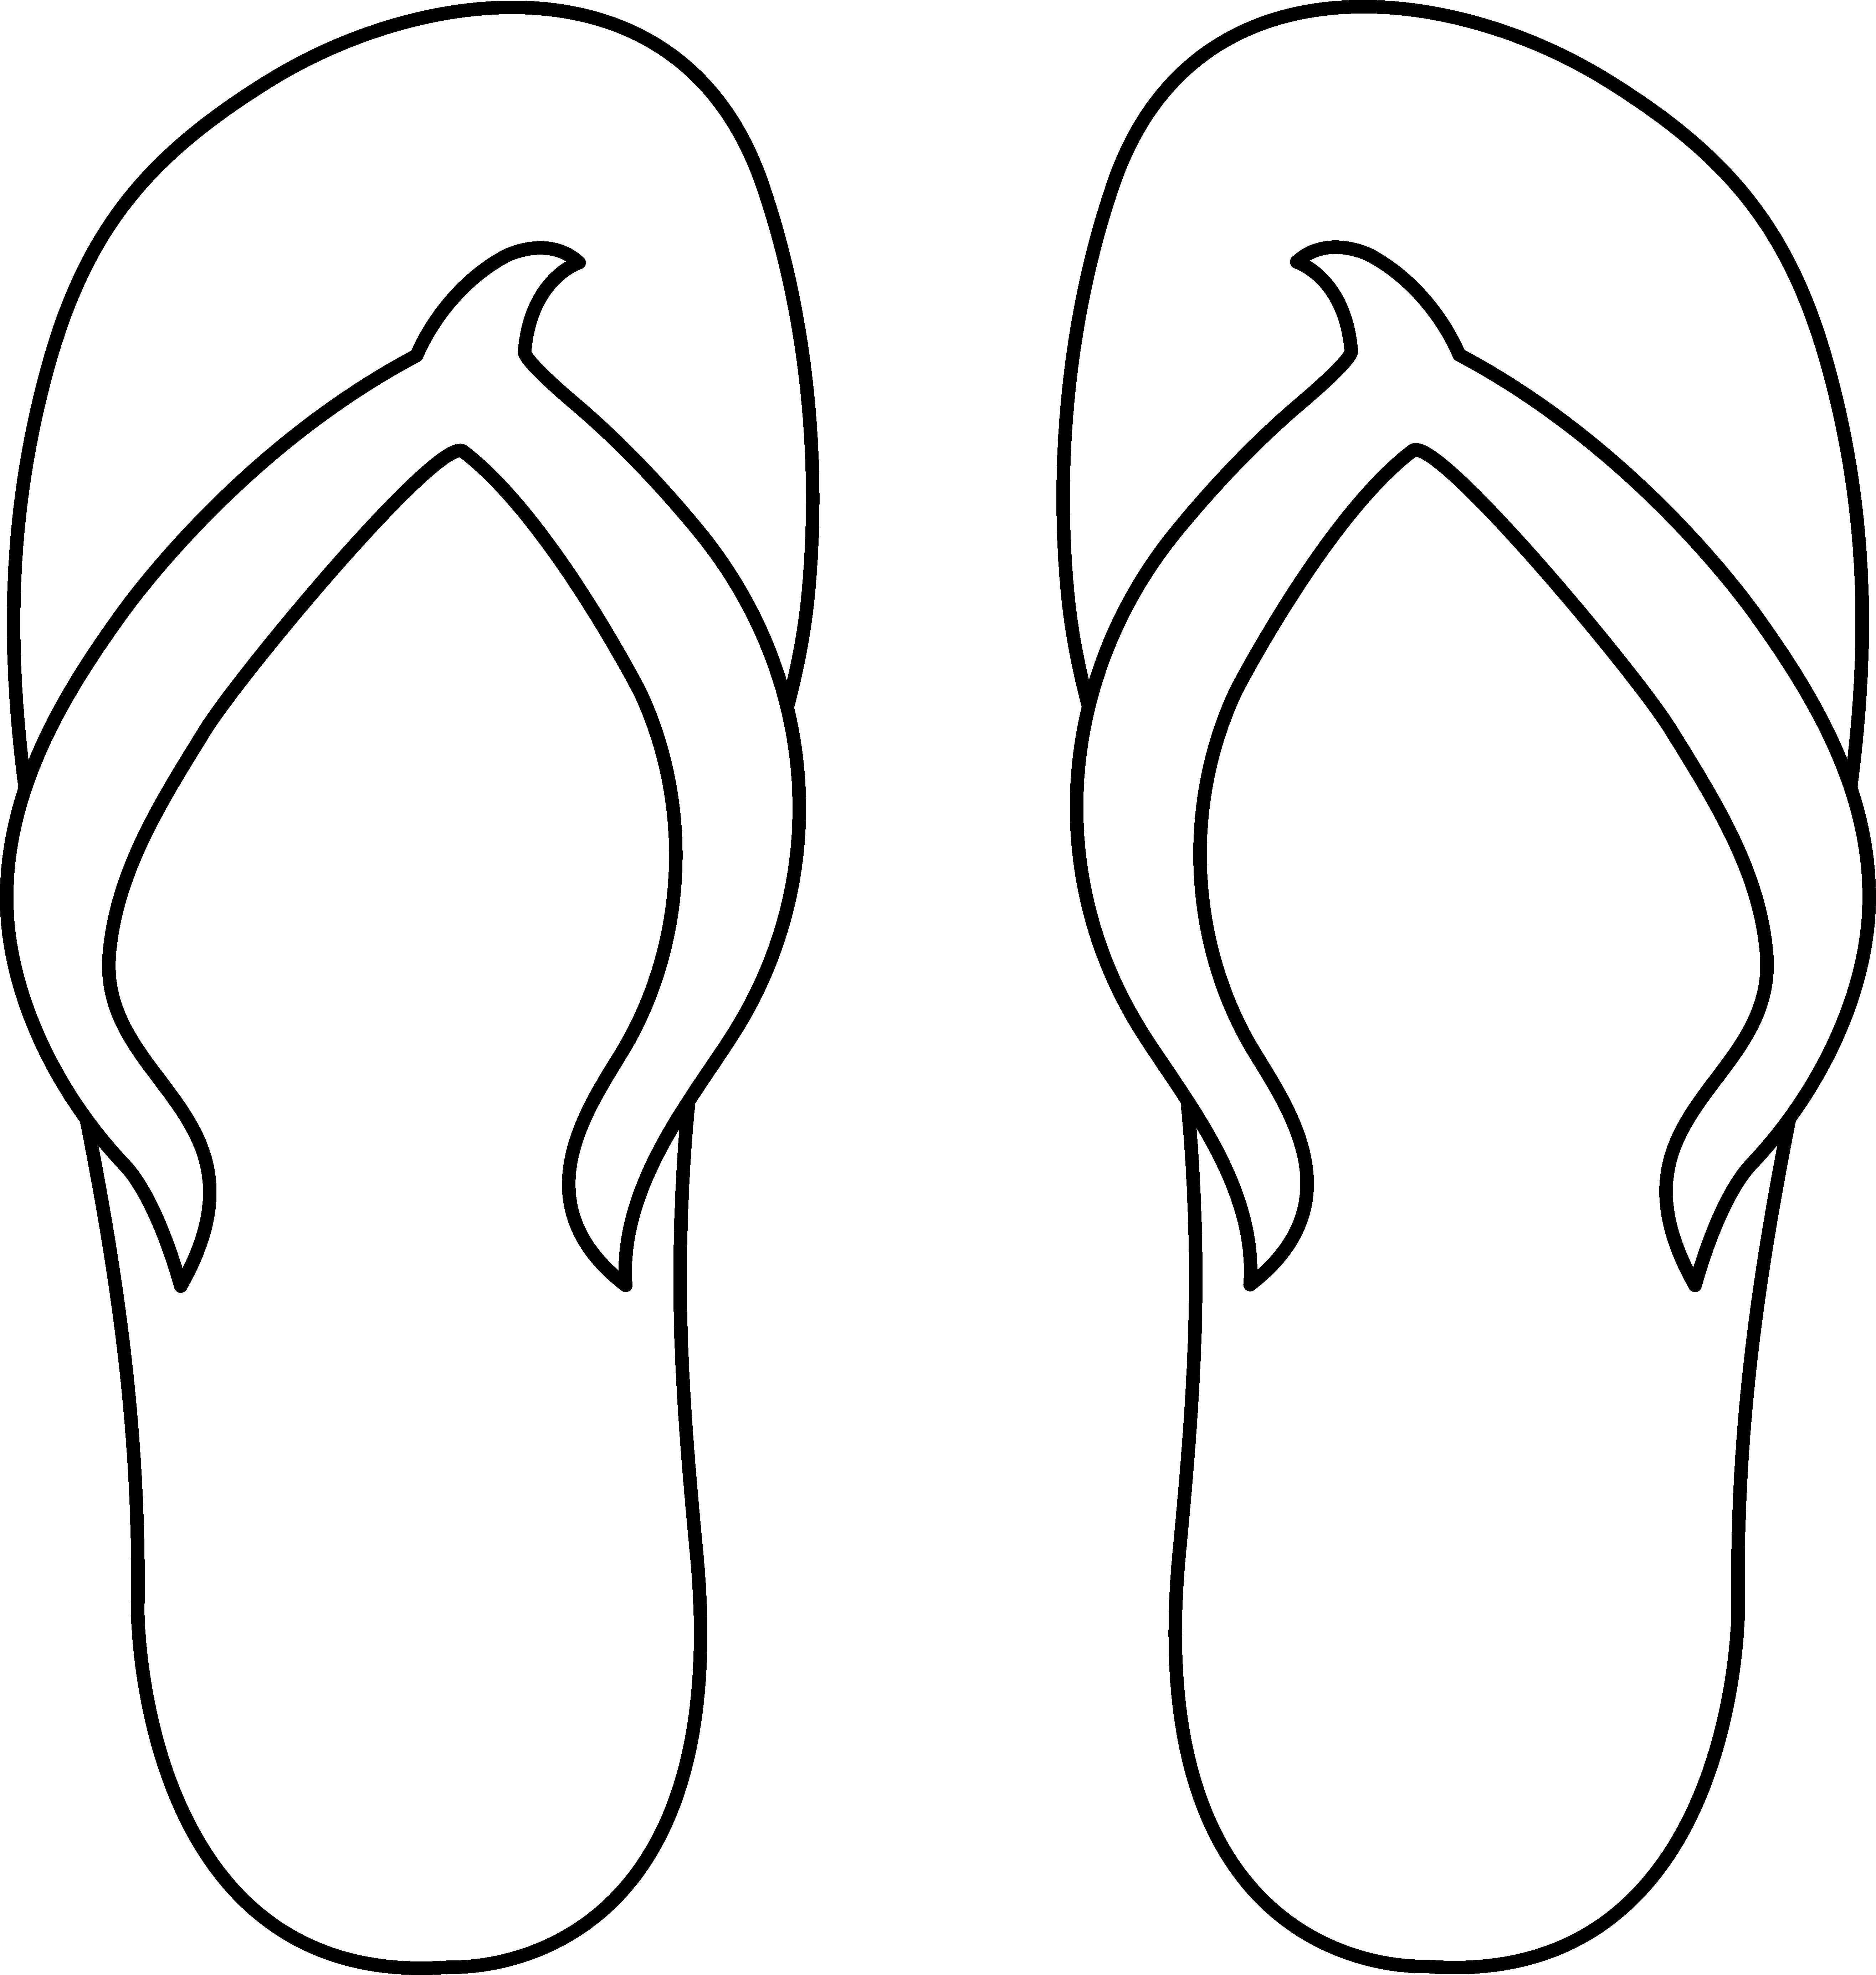 Clipart flip book svg free Colorable Flip Flops - for gr 5: one shoe for elem. school; the ... svg free